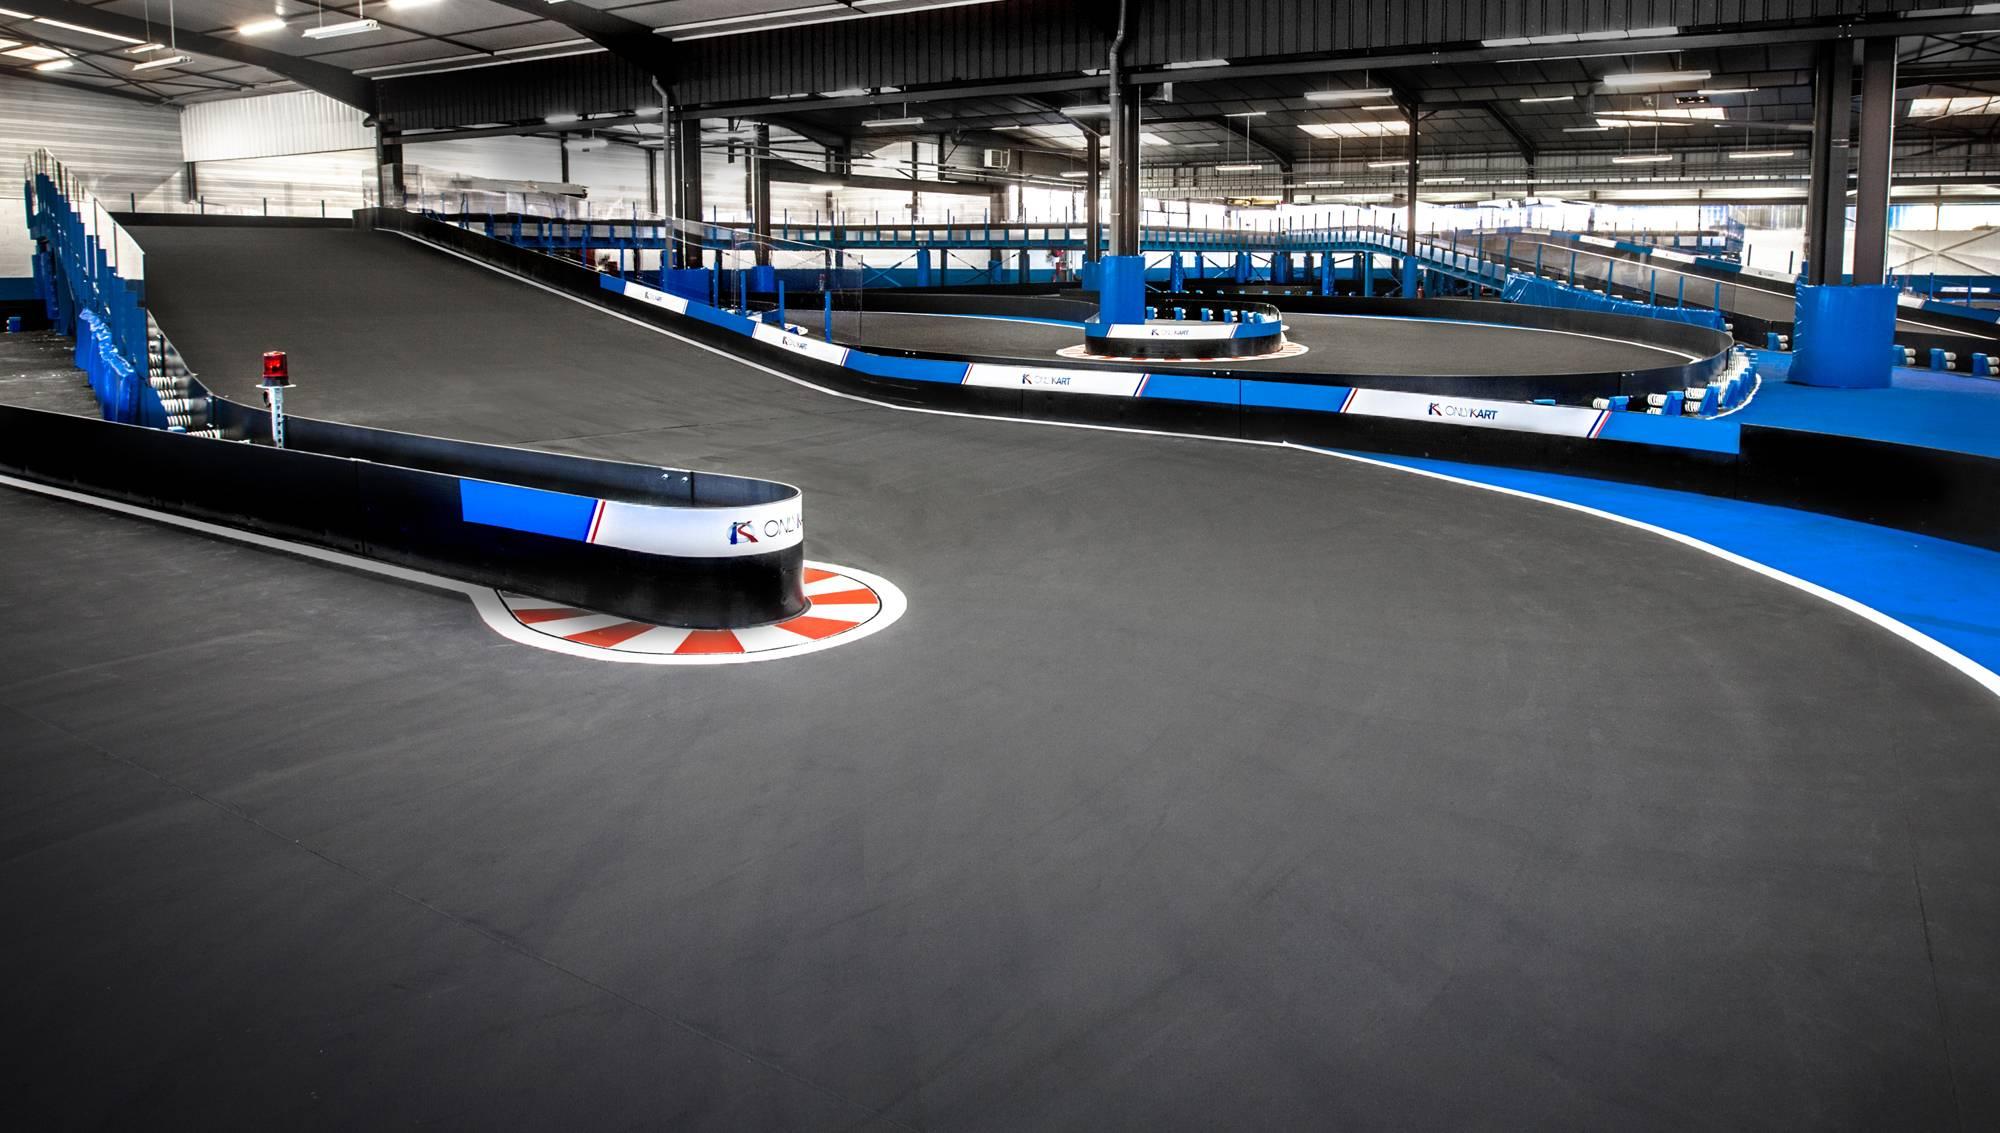 piste kart multi-niveaux à lyon